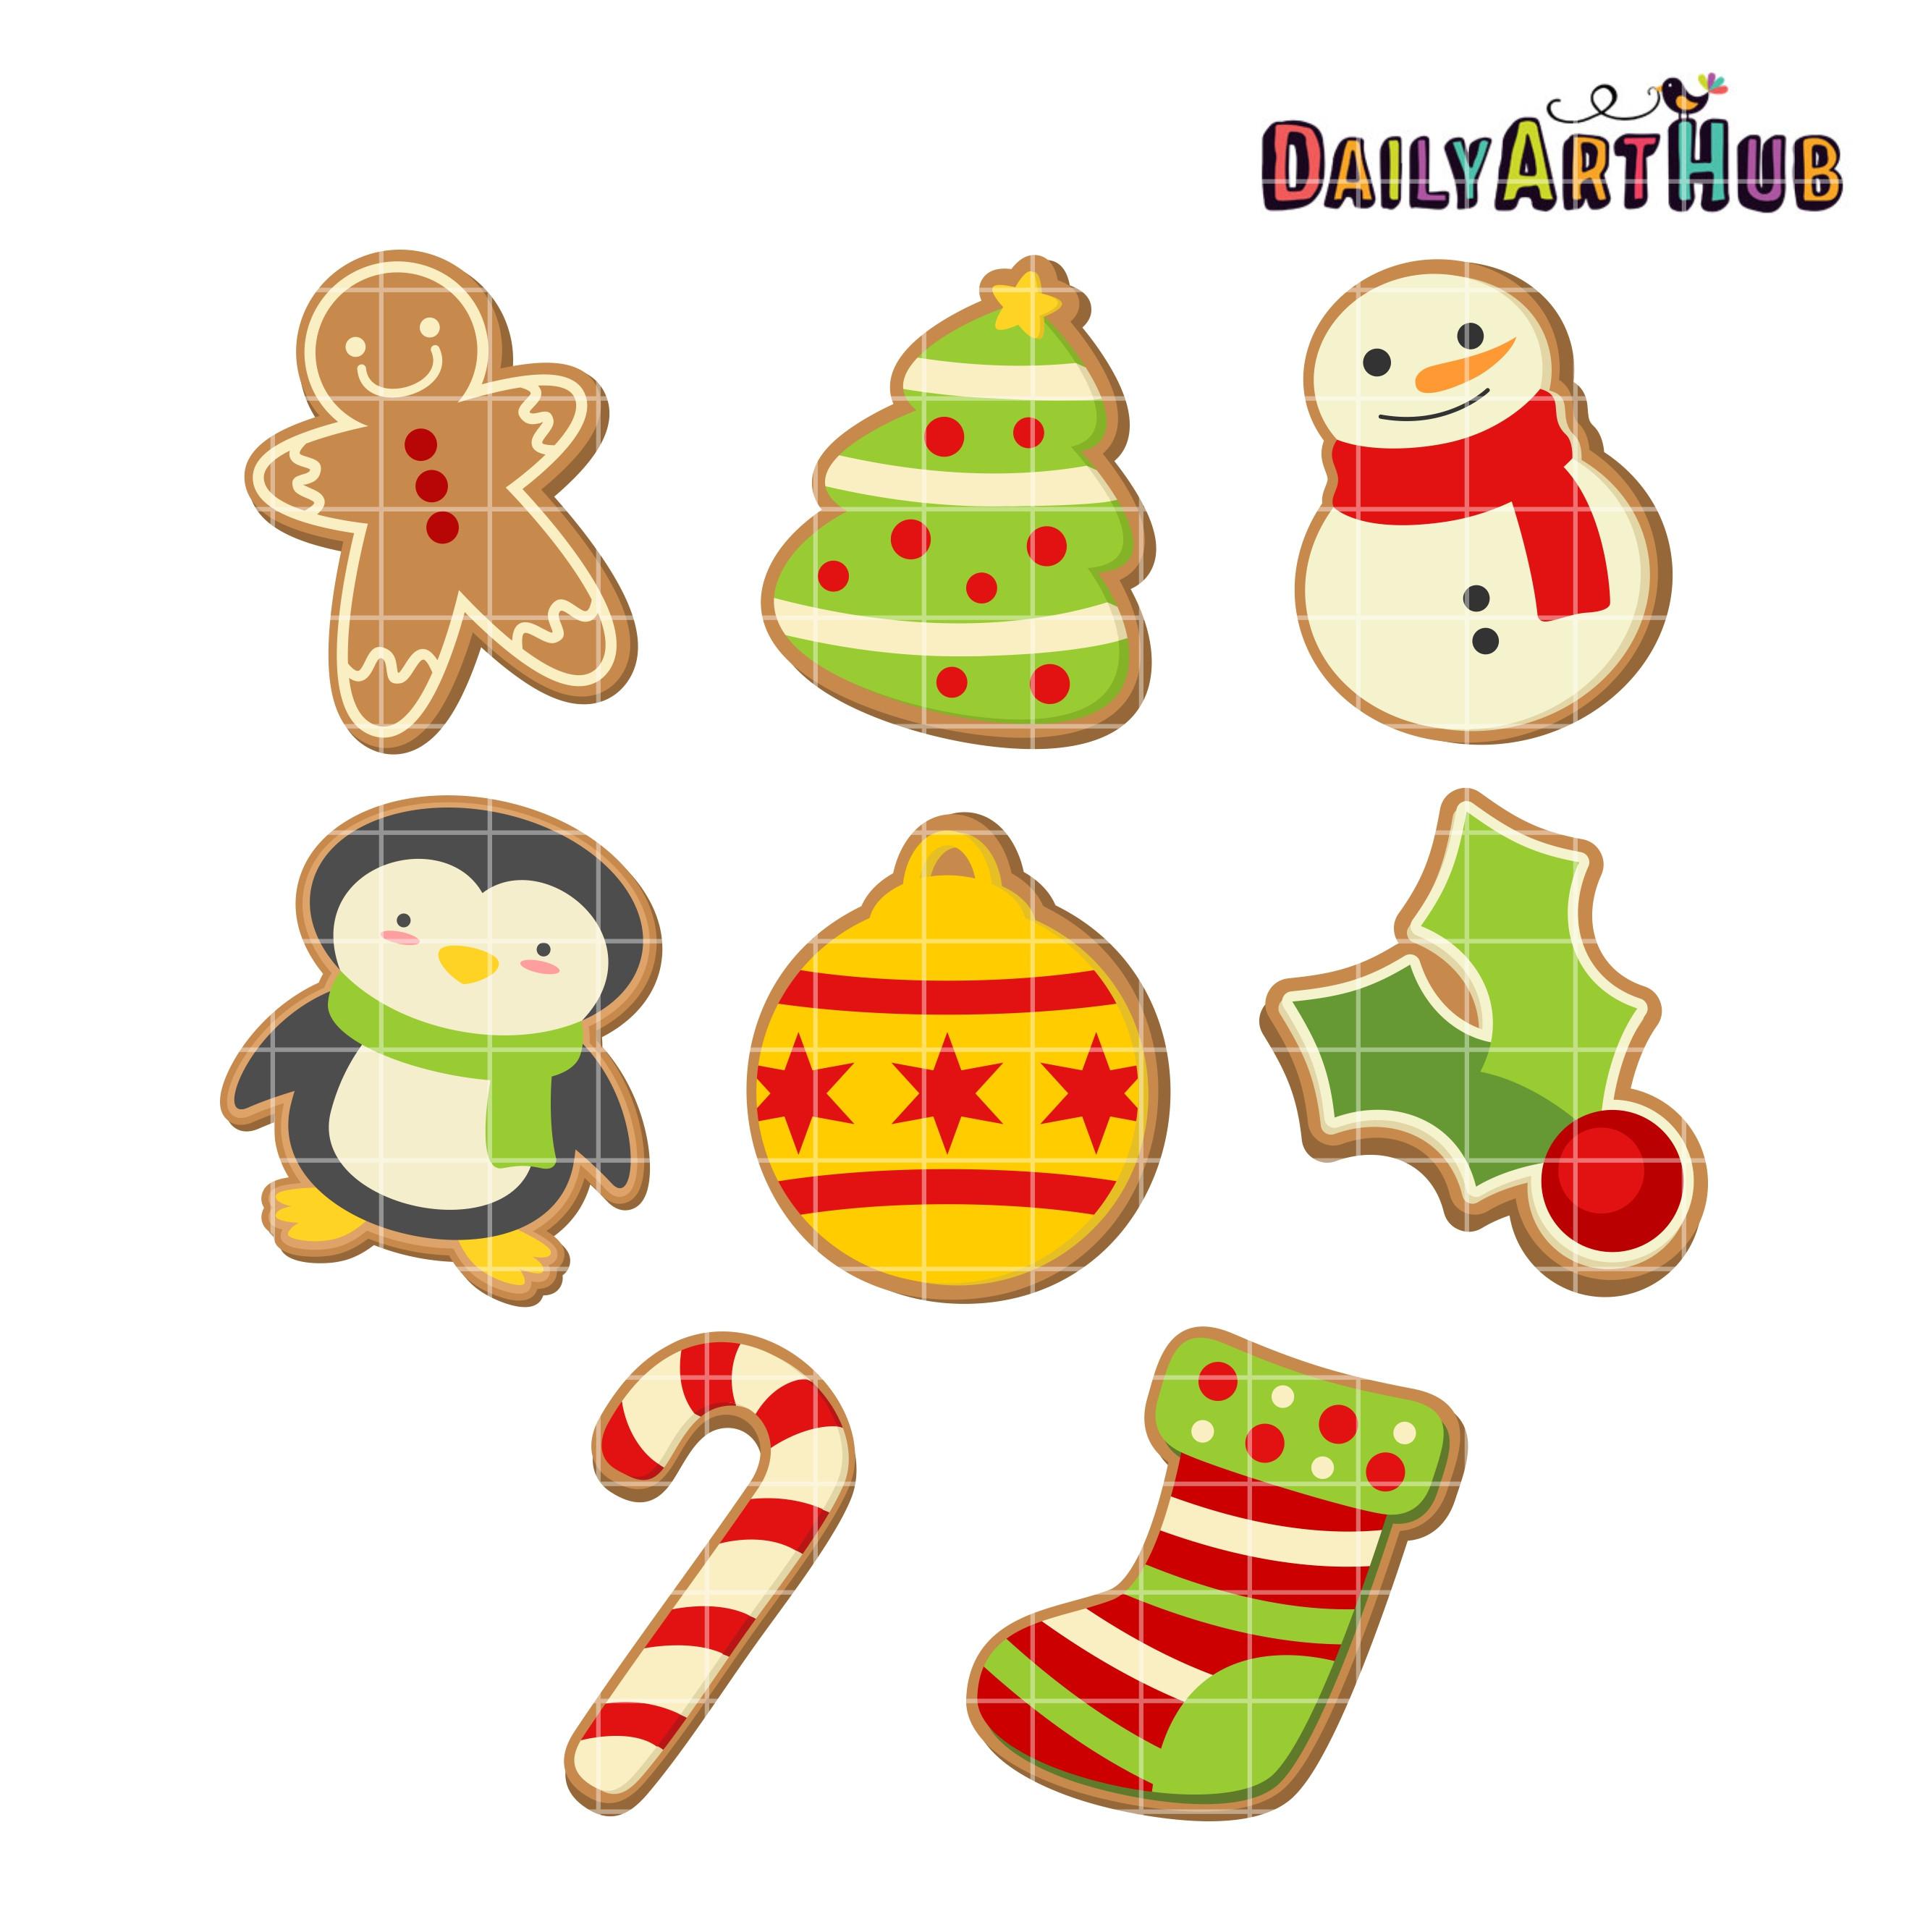 Christmas Baking Clipart  Christmas Cookies Clip Art Set – Daily Art Hub – Free Clip